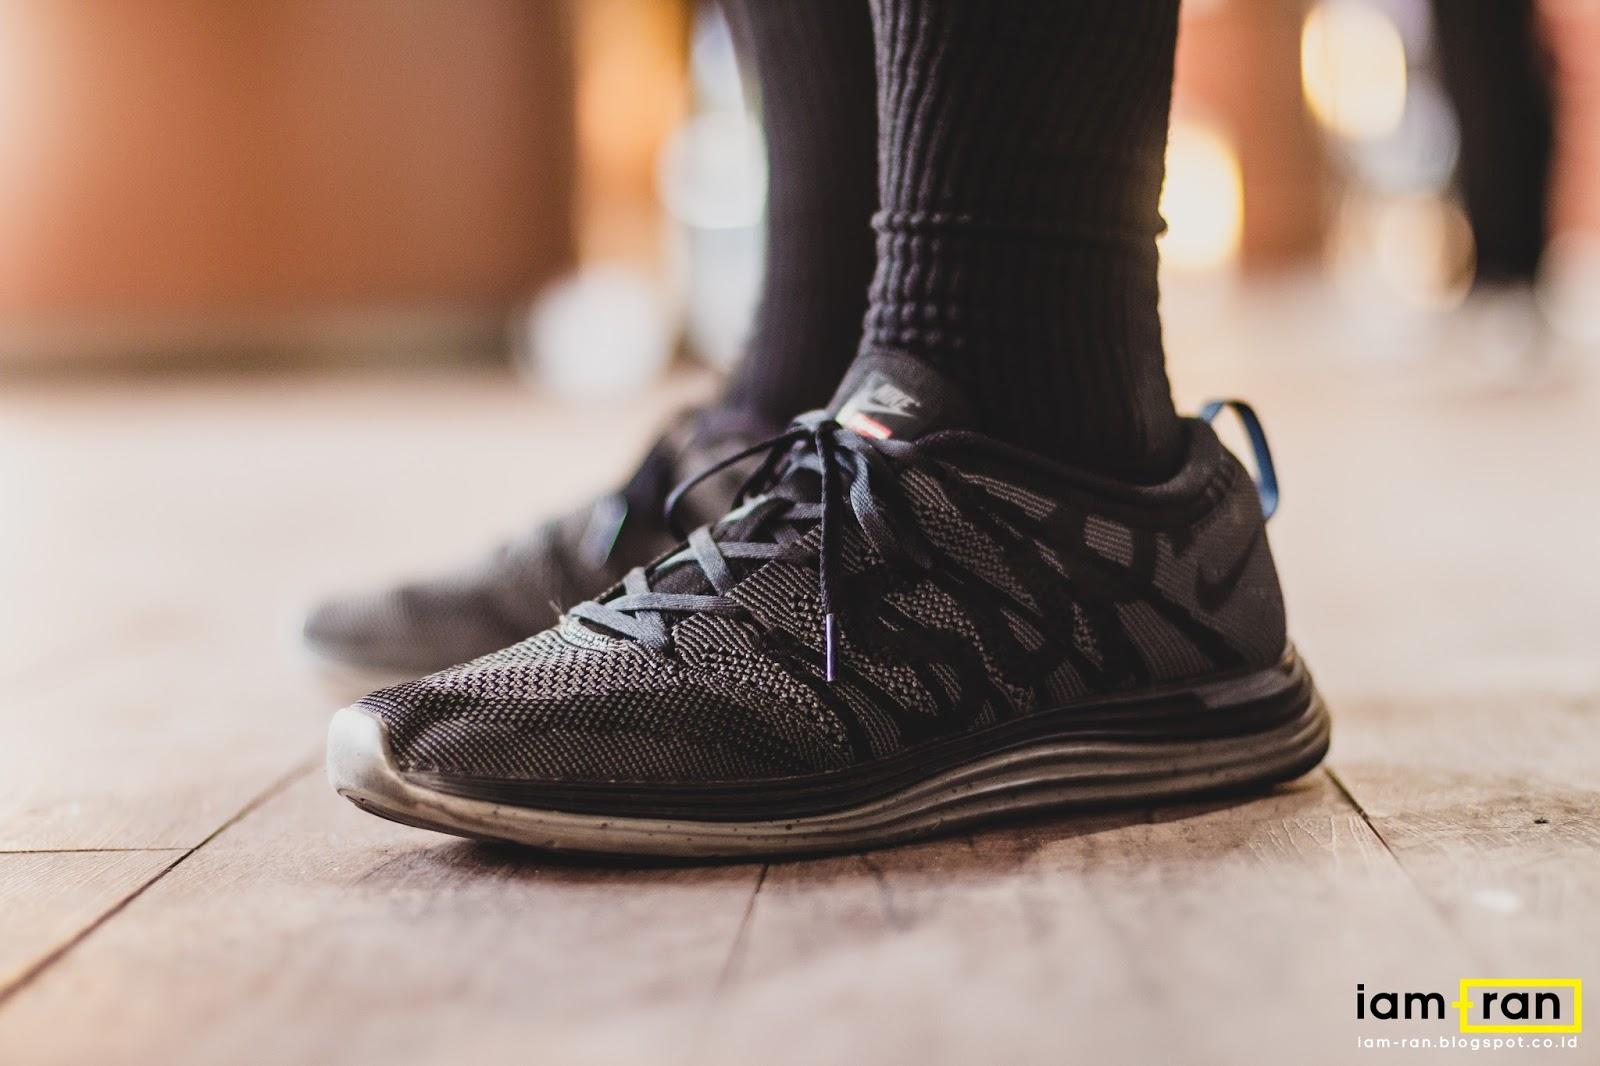 buy popular 07965 1ad2f ... Sneakers Nike Flyknit Lunar 1 x Supreme. iam.ran06 ...